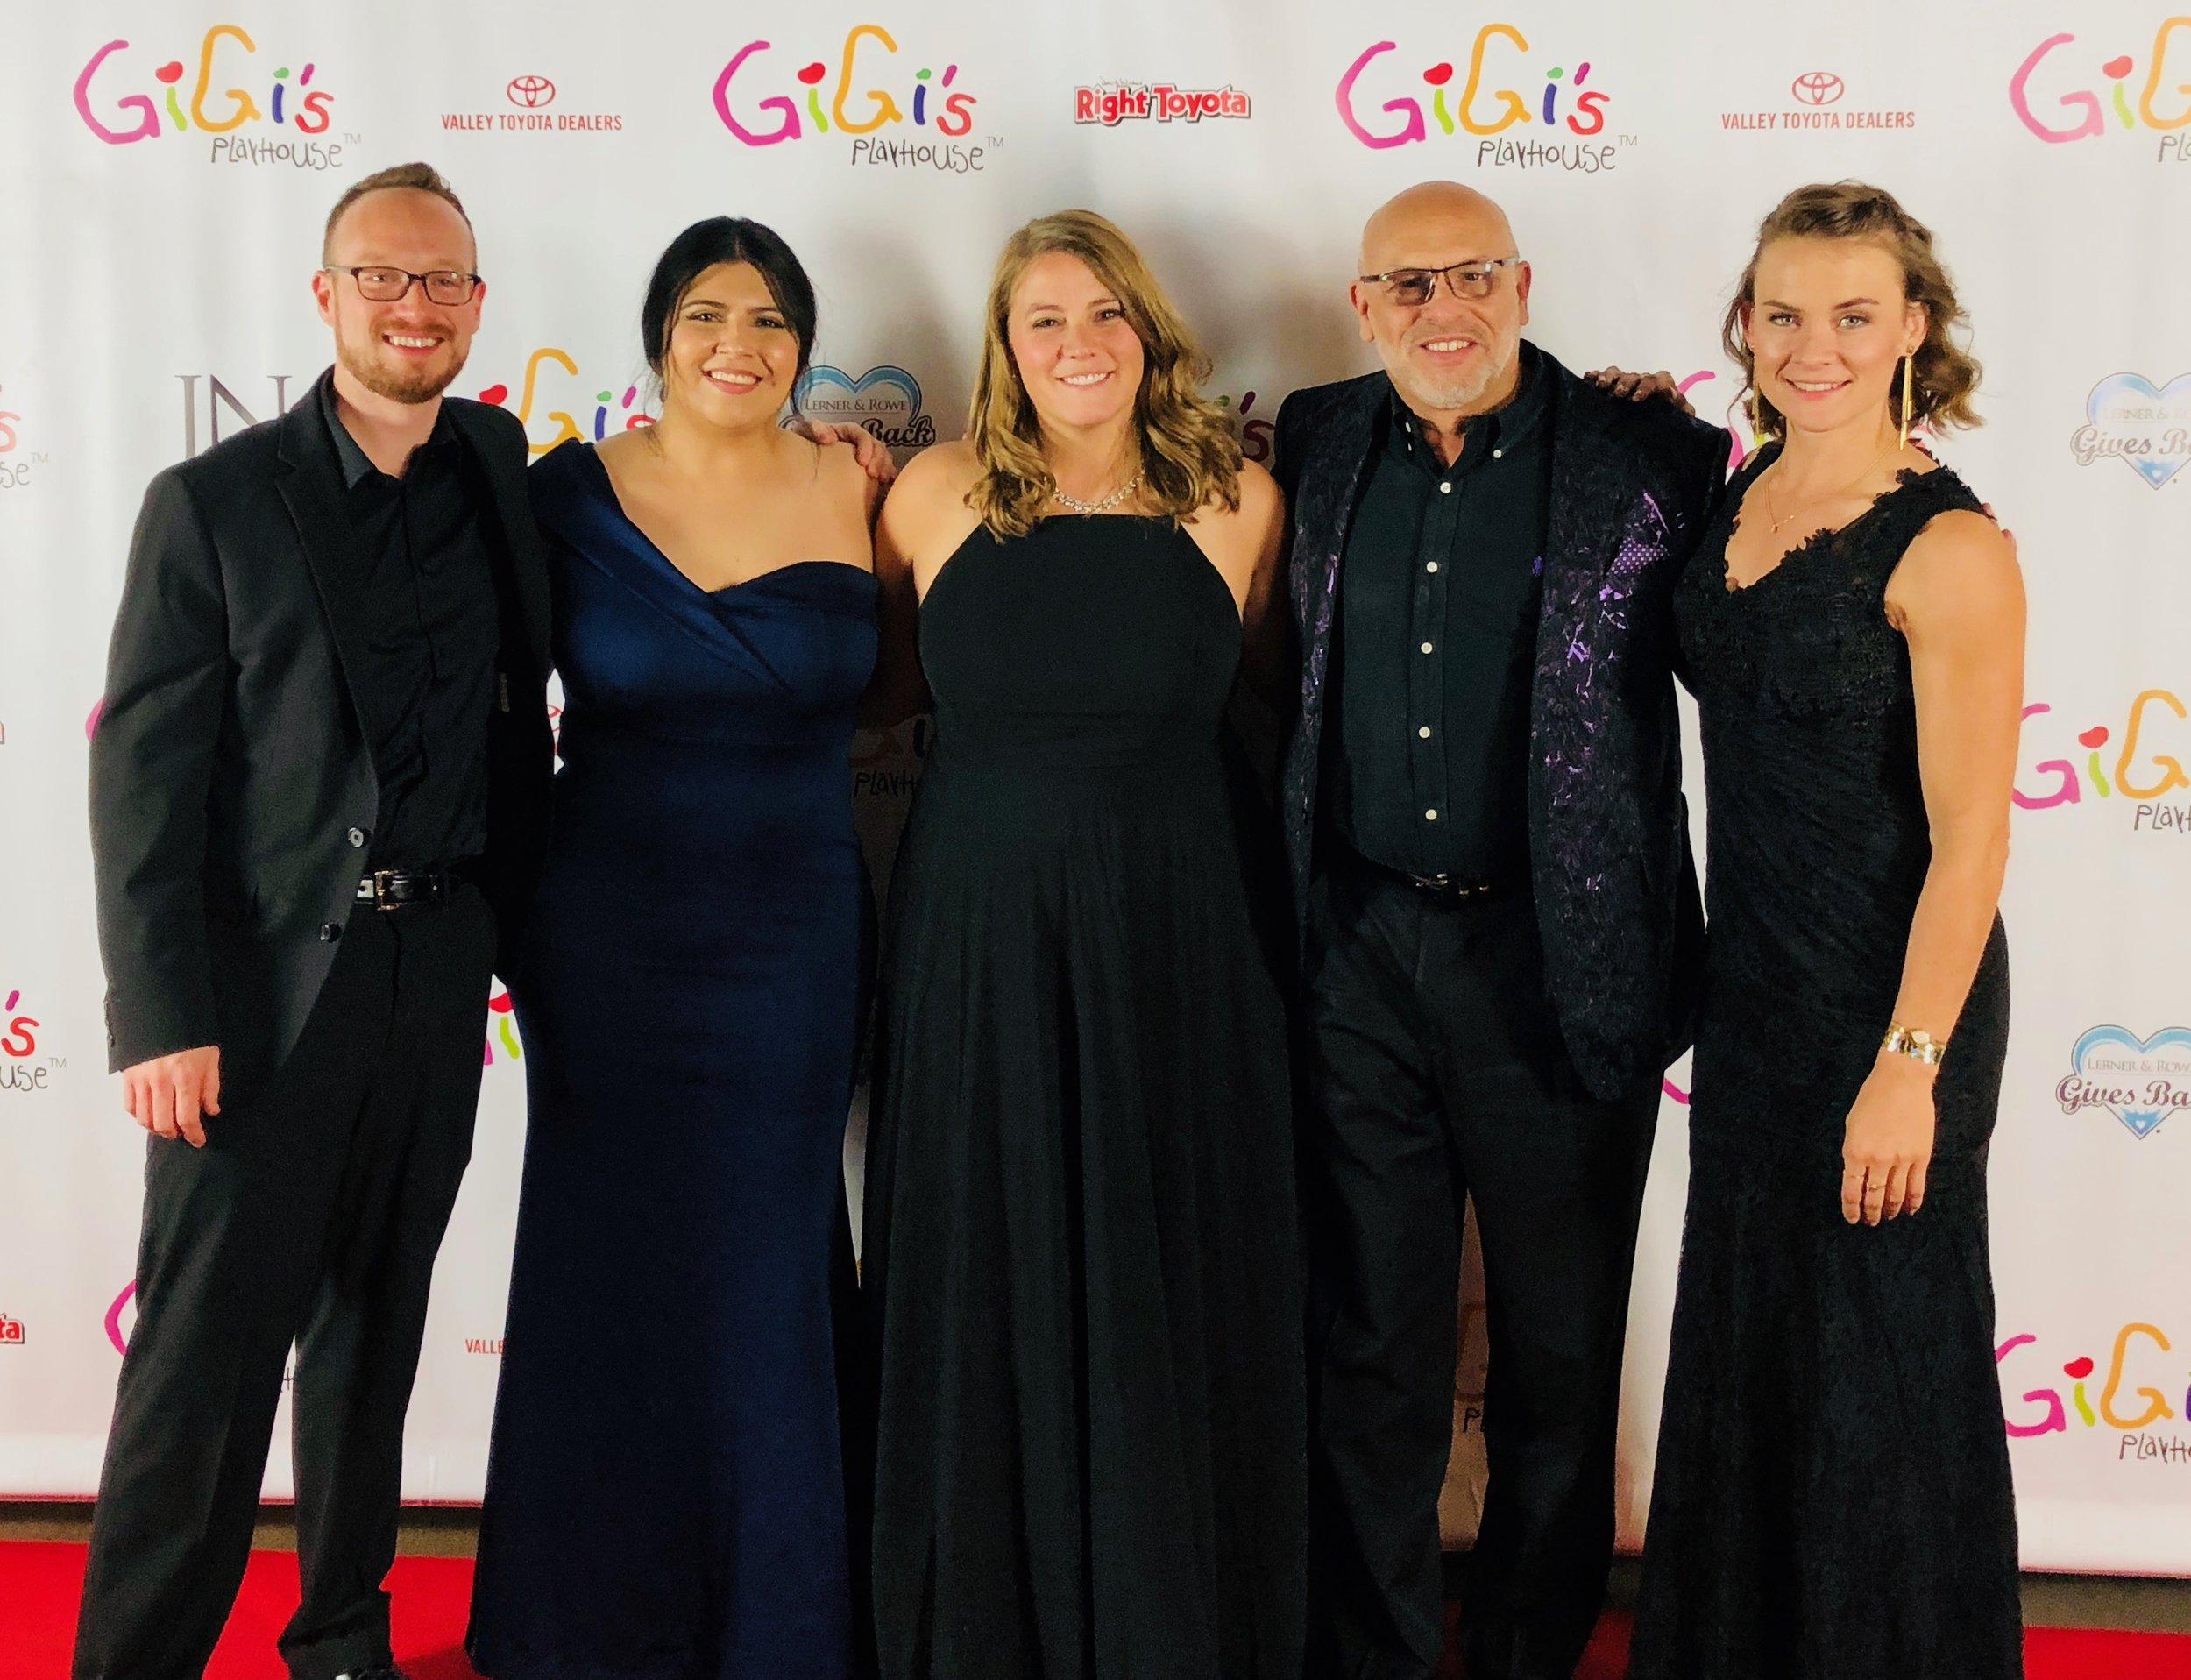 Damon Wake, Angeline Ponce, Nikka Bochniak, MC and Kim Schroeder at the Gigi's Gala